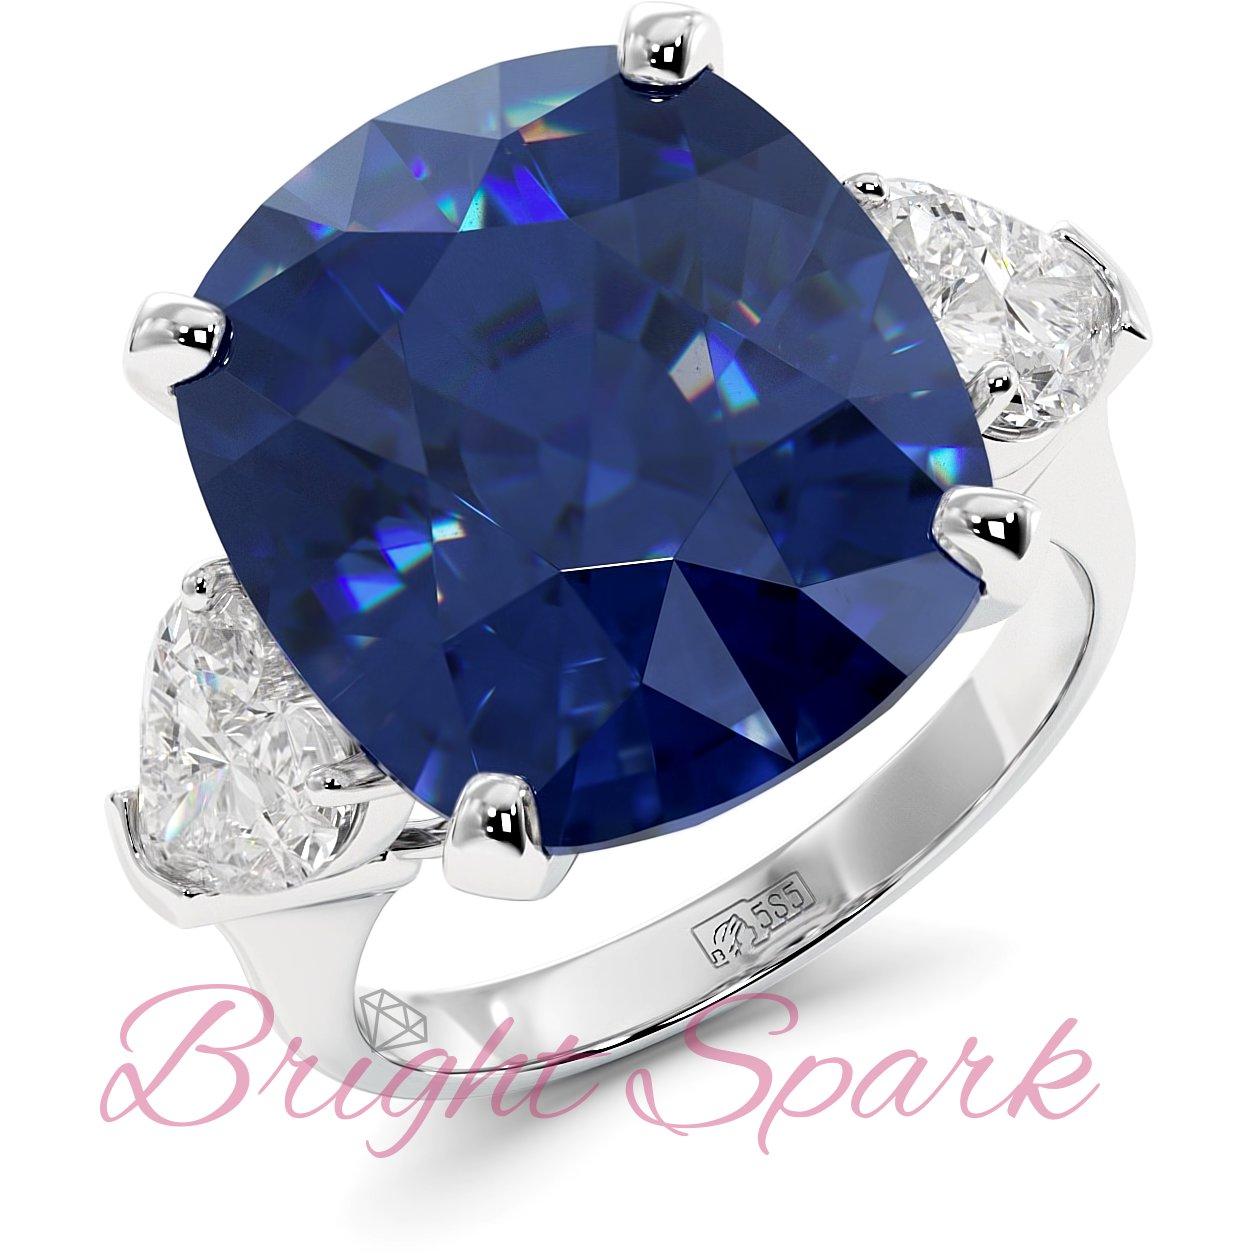 Золотое кольцо с синим сапфиром кушон и камнями сердце Whitney 16,5 карат